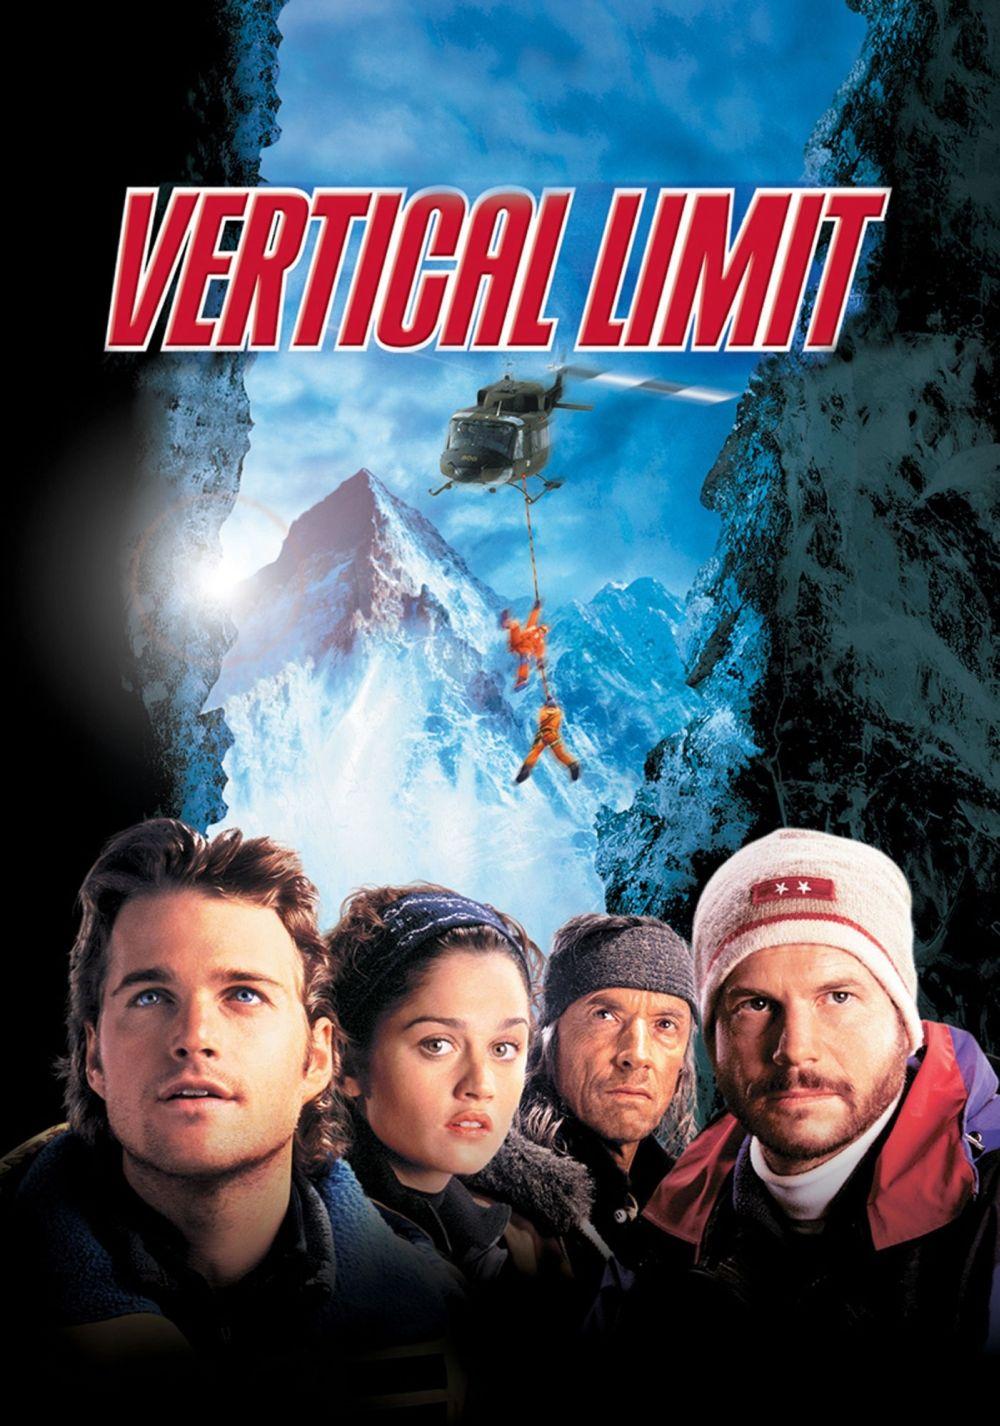 vertical-limit-5660a4d3db137.jpg